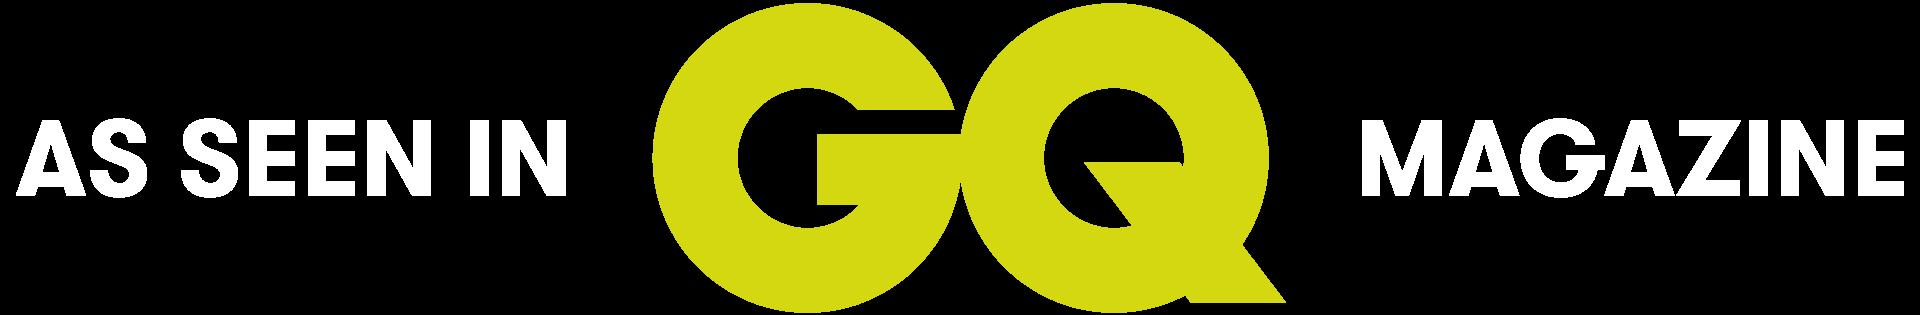 Milk_GQ_Web.png